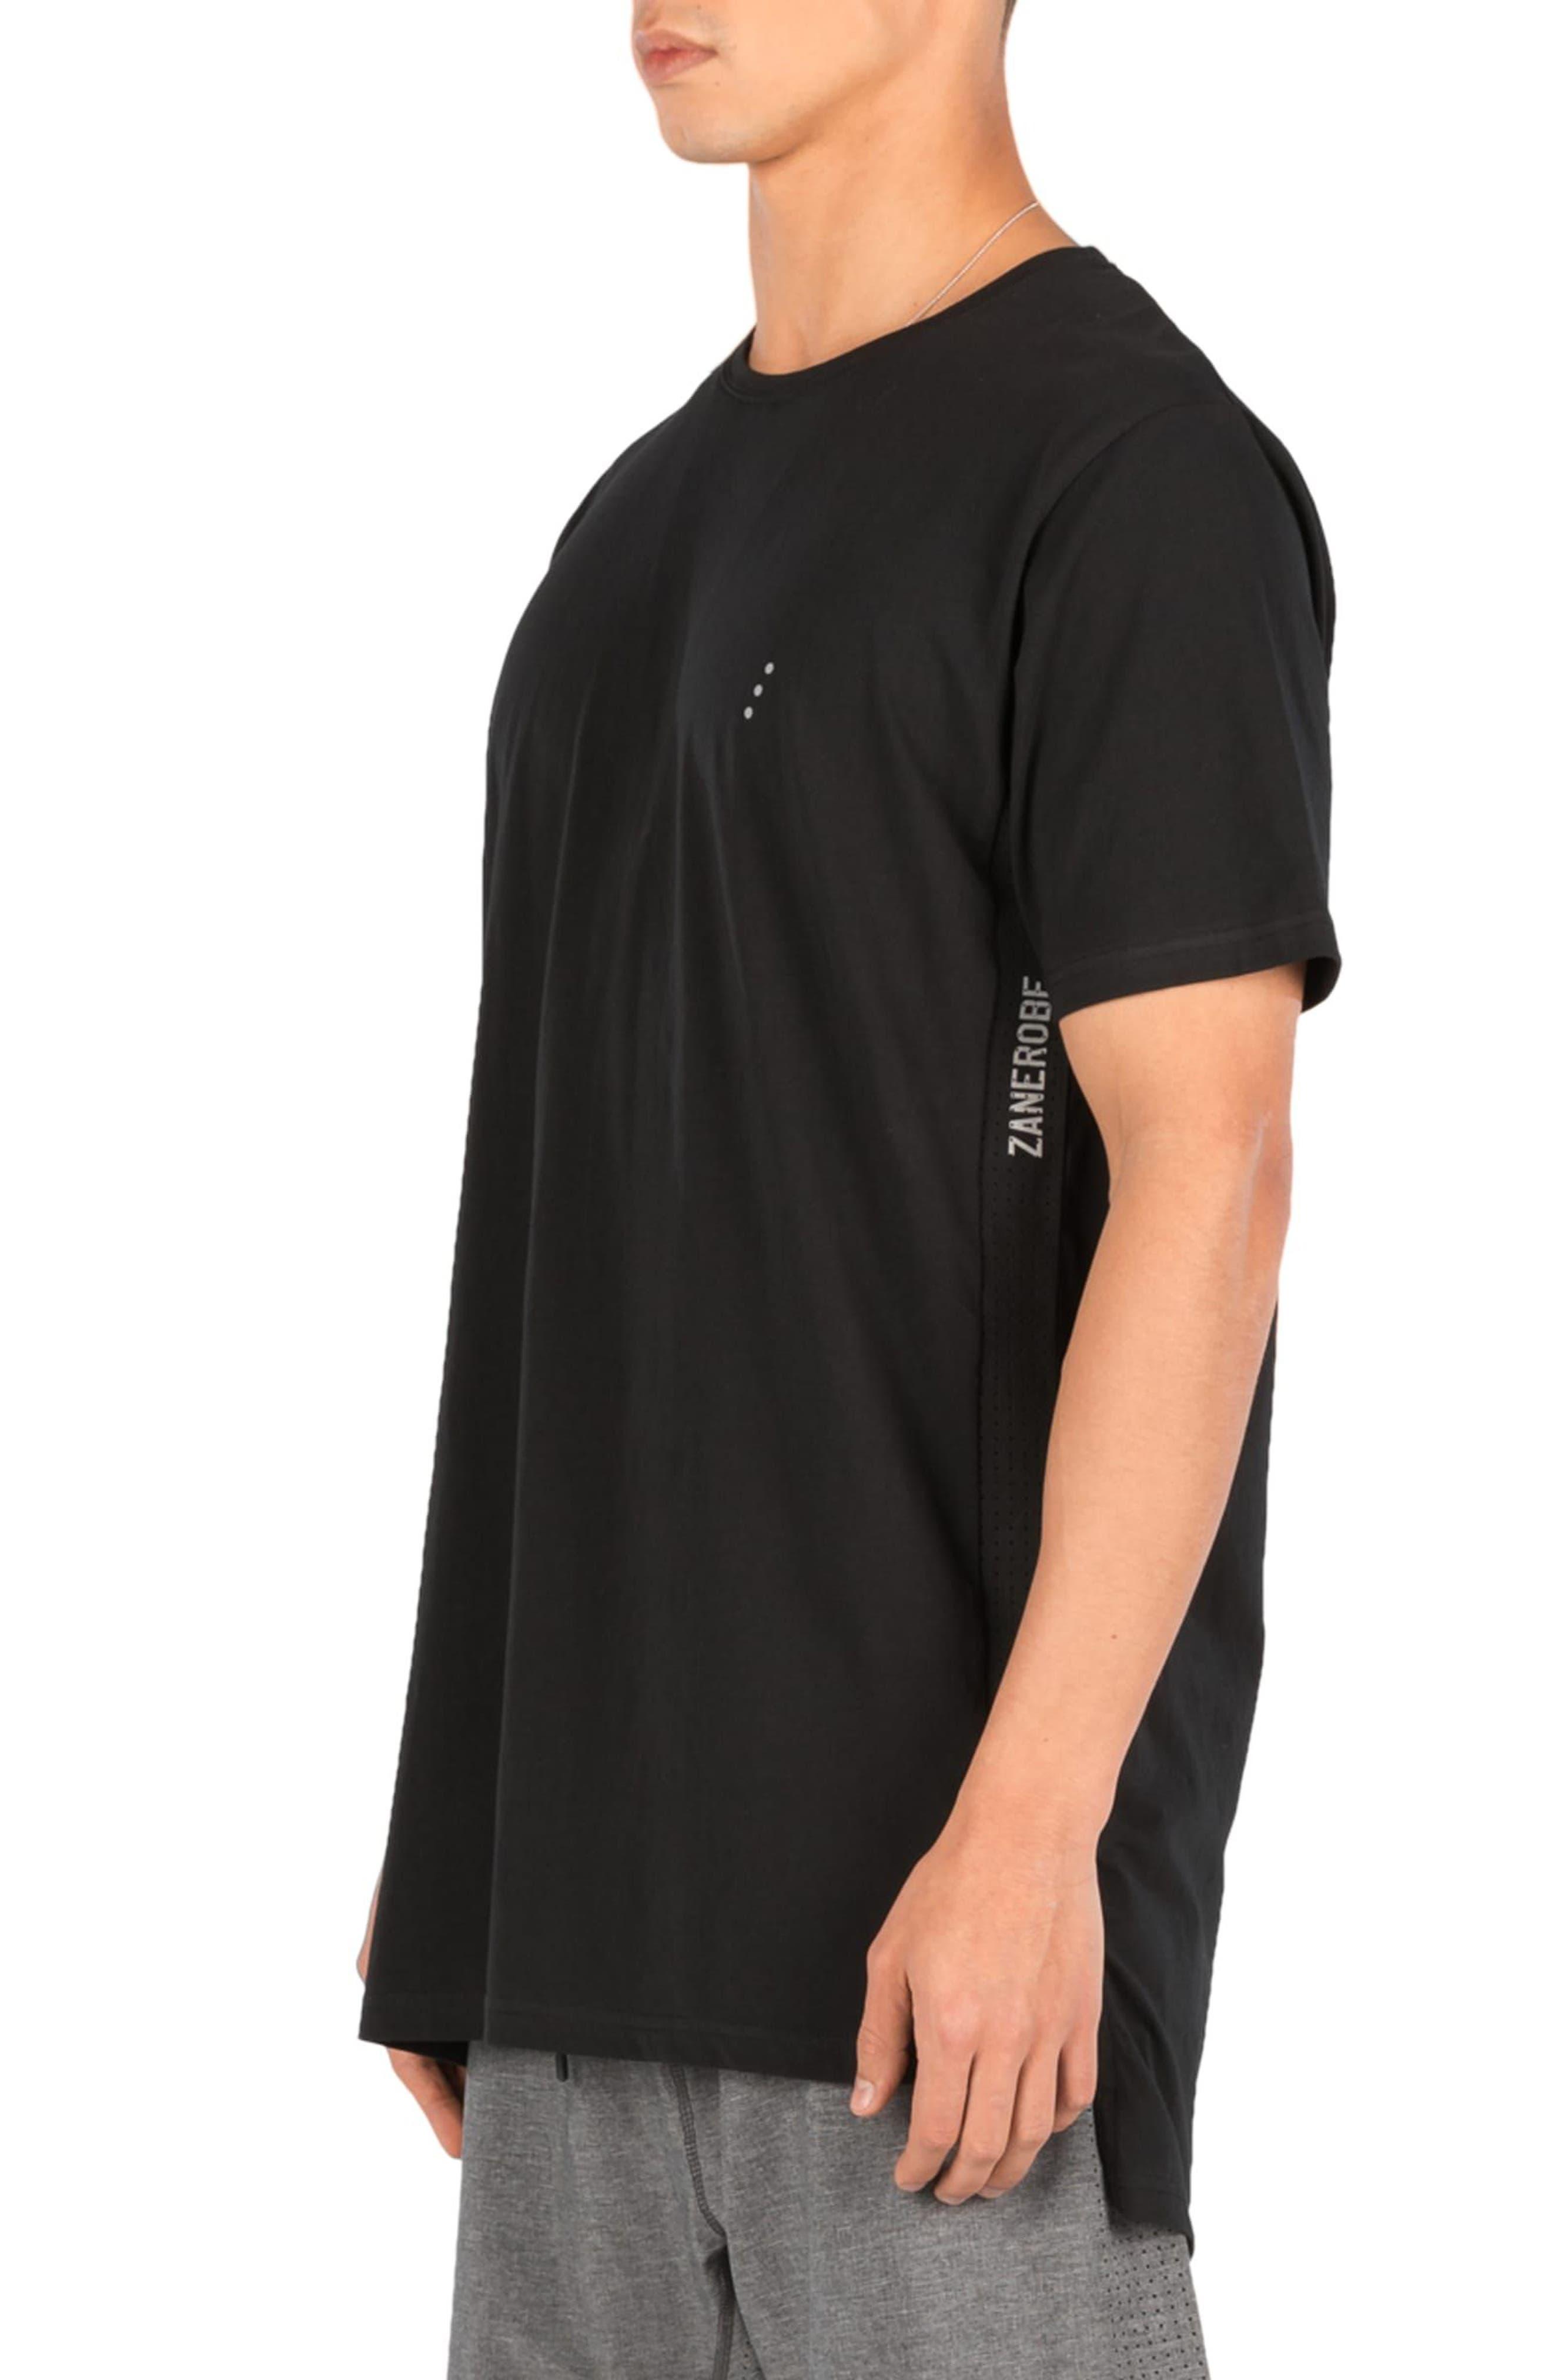 Flintlock Performance T-Shirt,                             Alternate thumbnail 4, color,                             Black